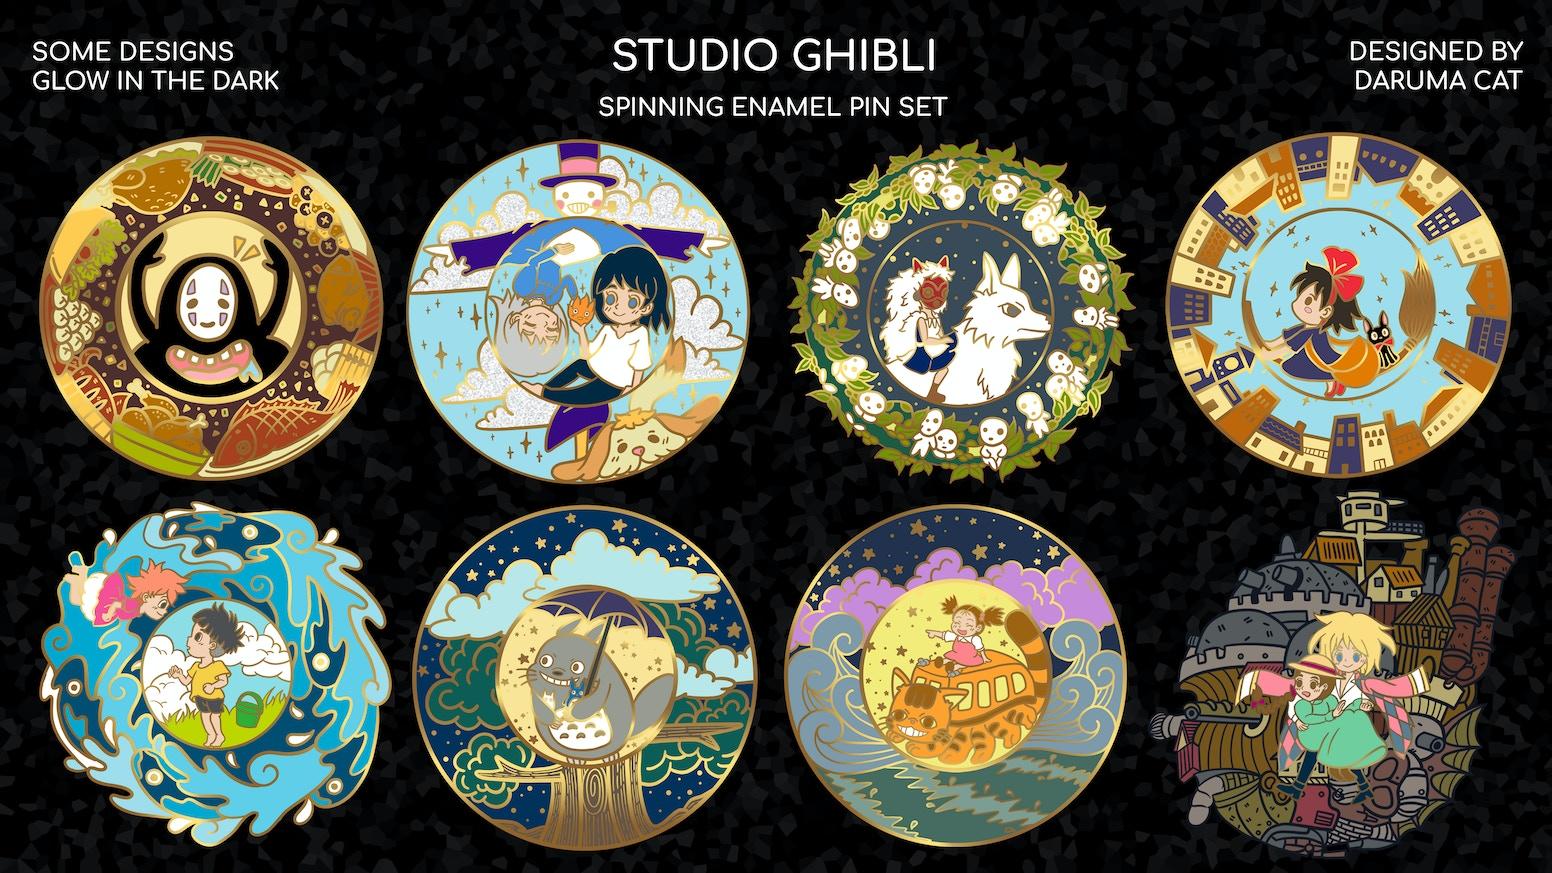 STUDIO GHIBLI SPINNING HARD ENAMEL PIN SET by Daruma Cat